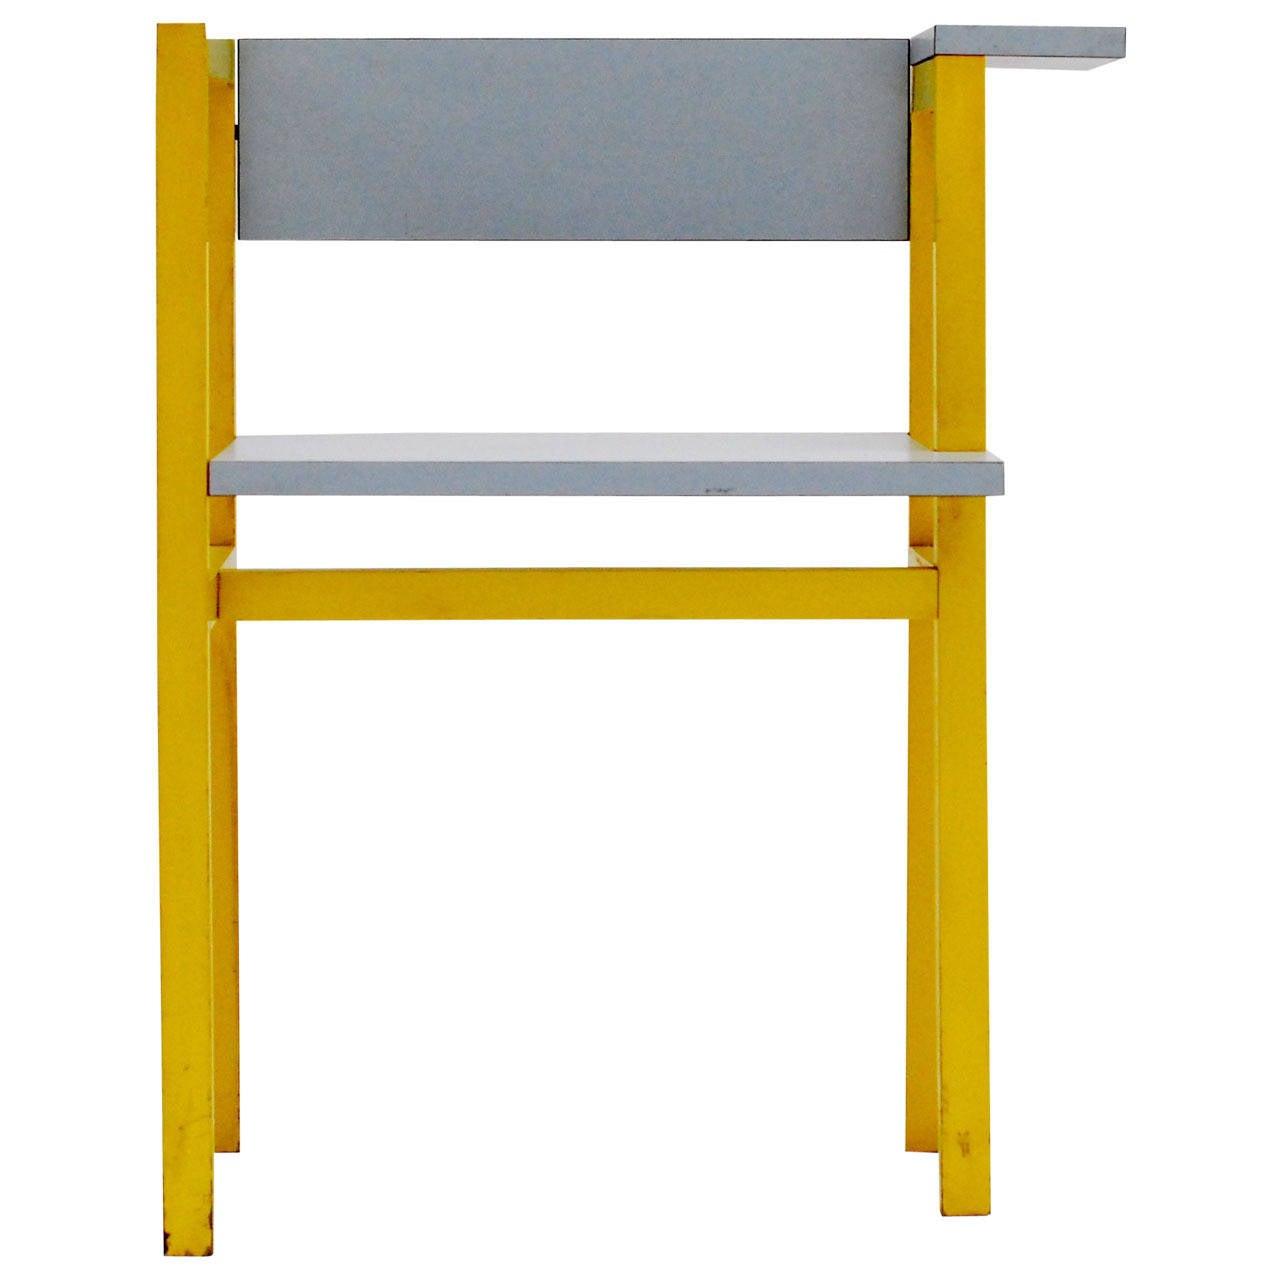 1975 Constructivist Modern Chair by Daniel Deltour 1